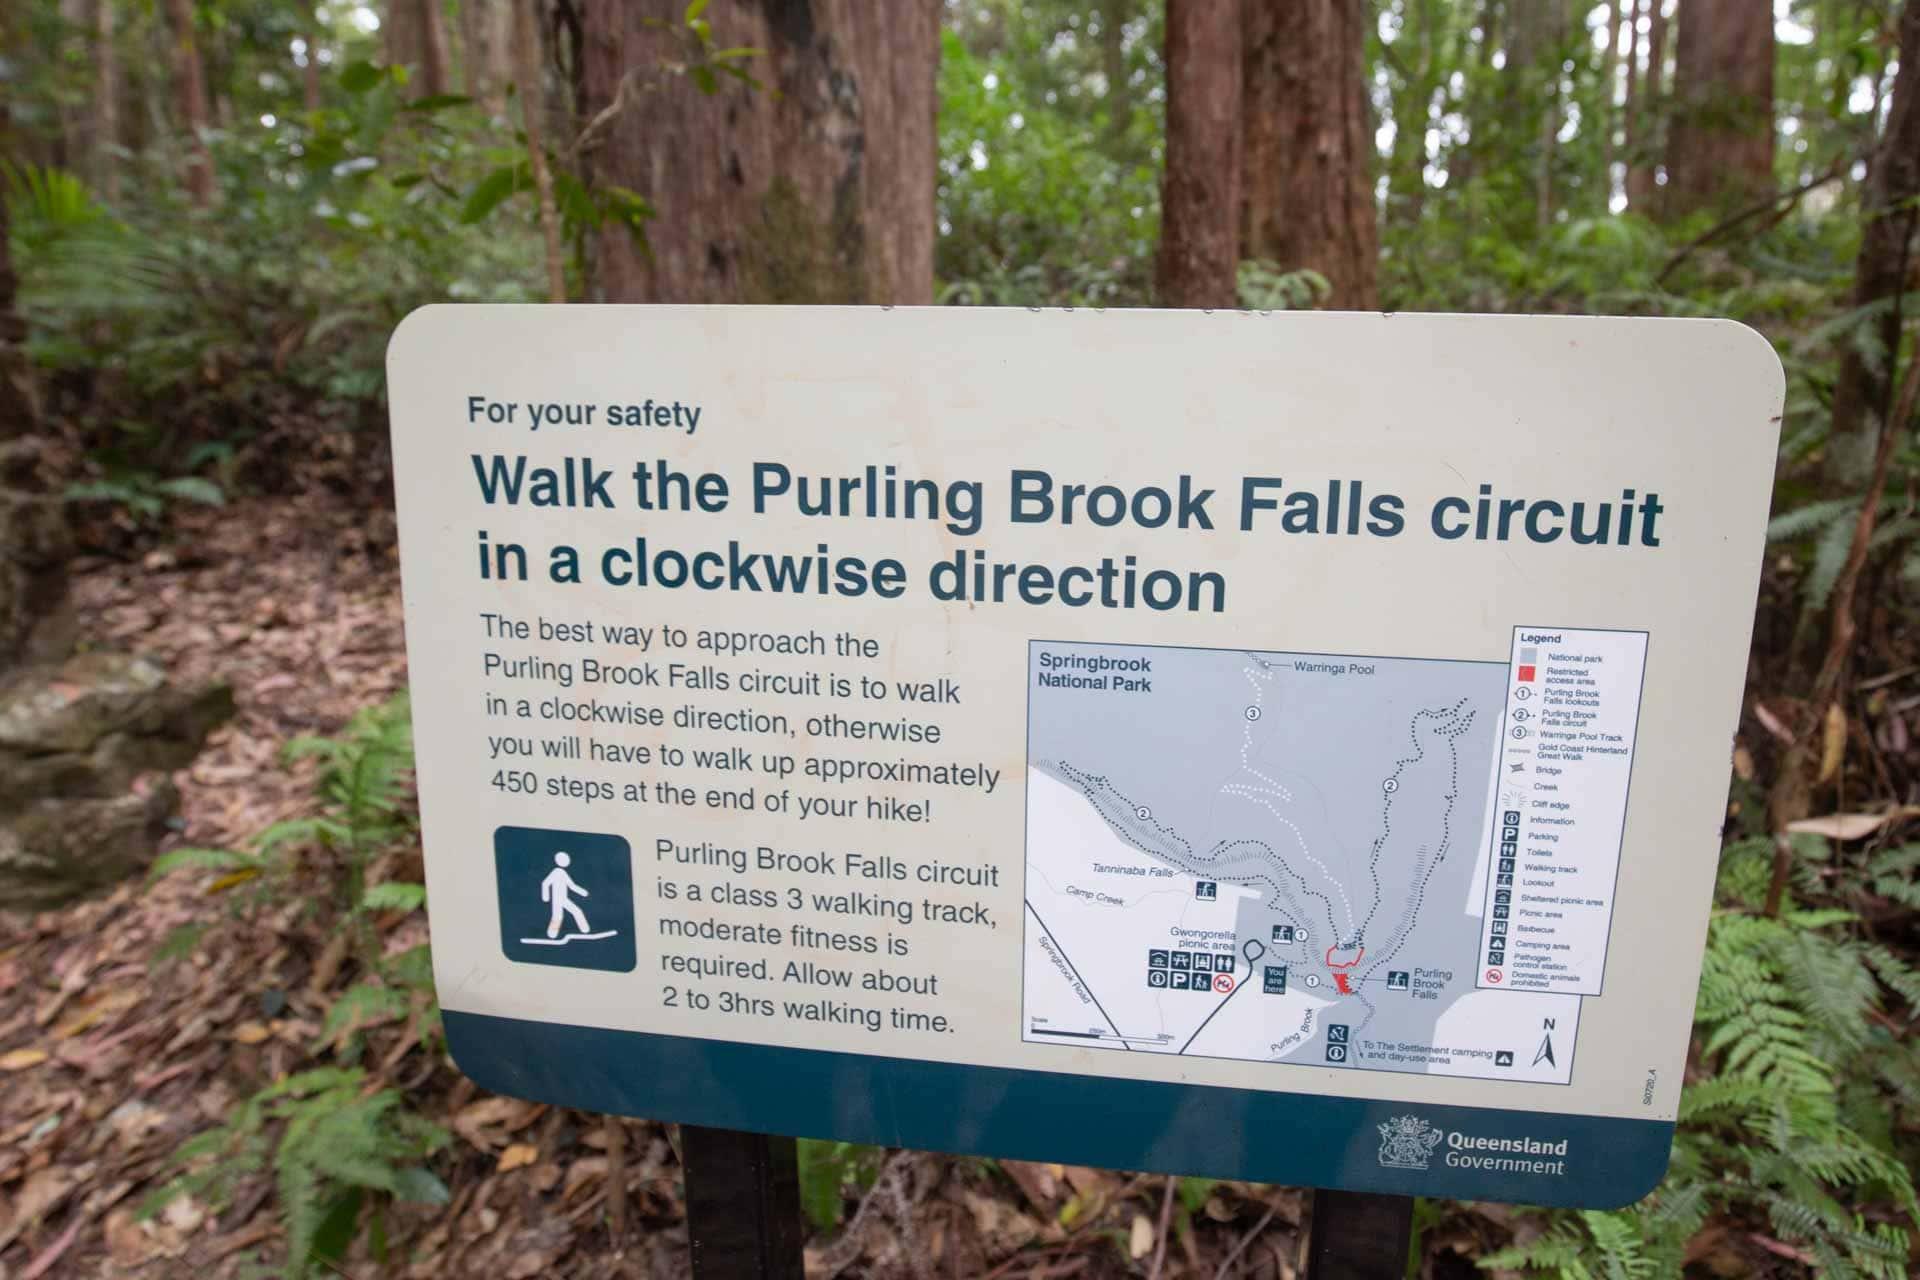 purling-brook-falls-springbrook-national-park-2